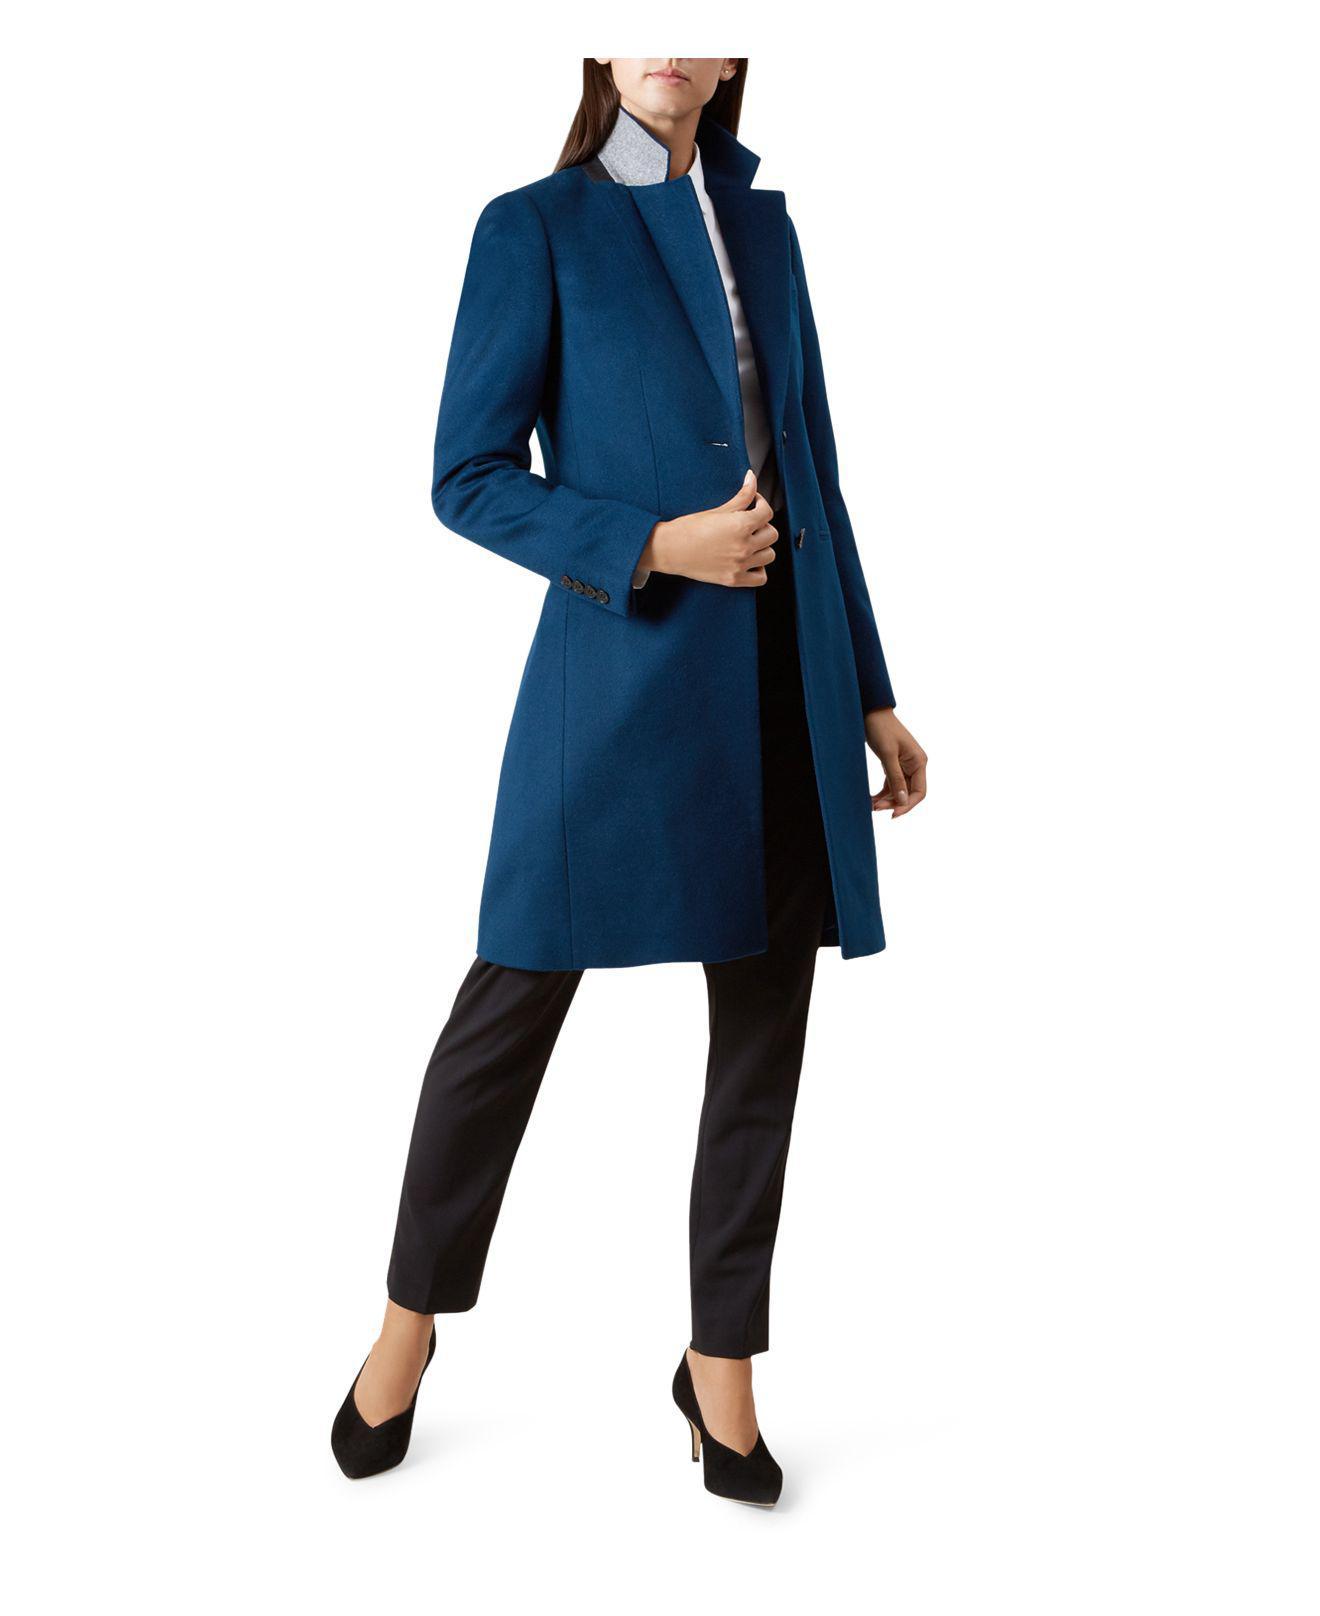 Lyst - Hobbs Tilda Wool Coat in Blue fd00cb5b2